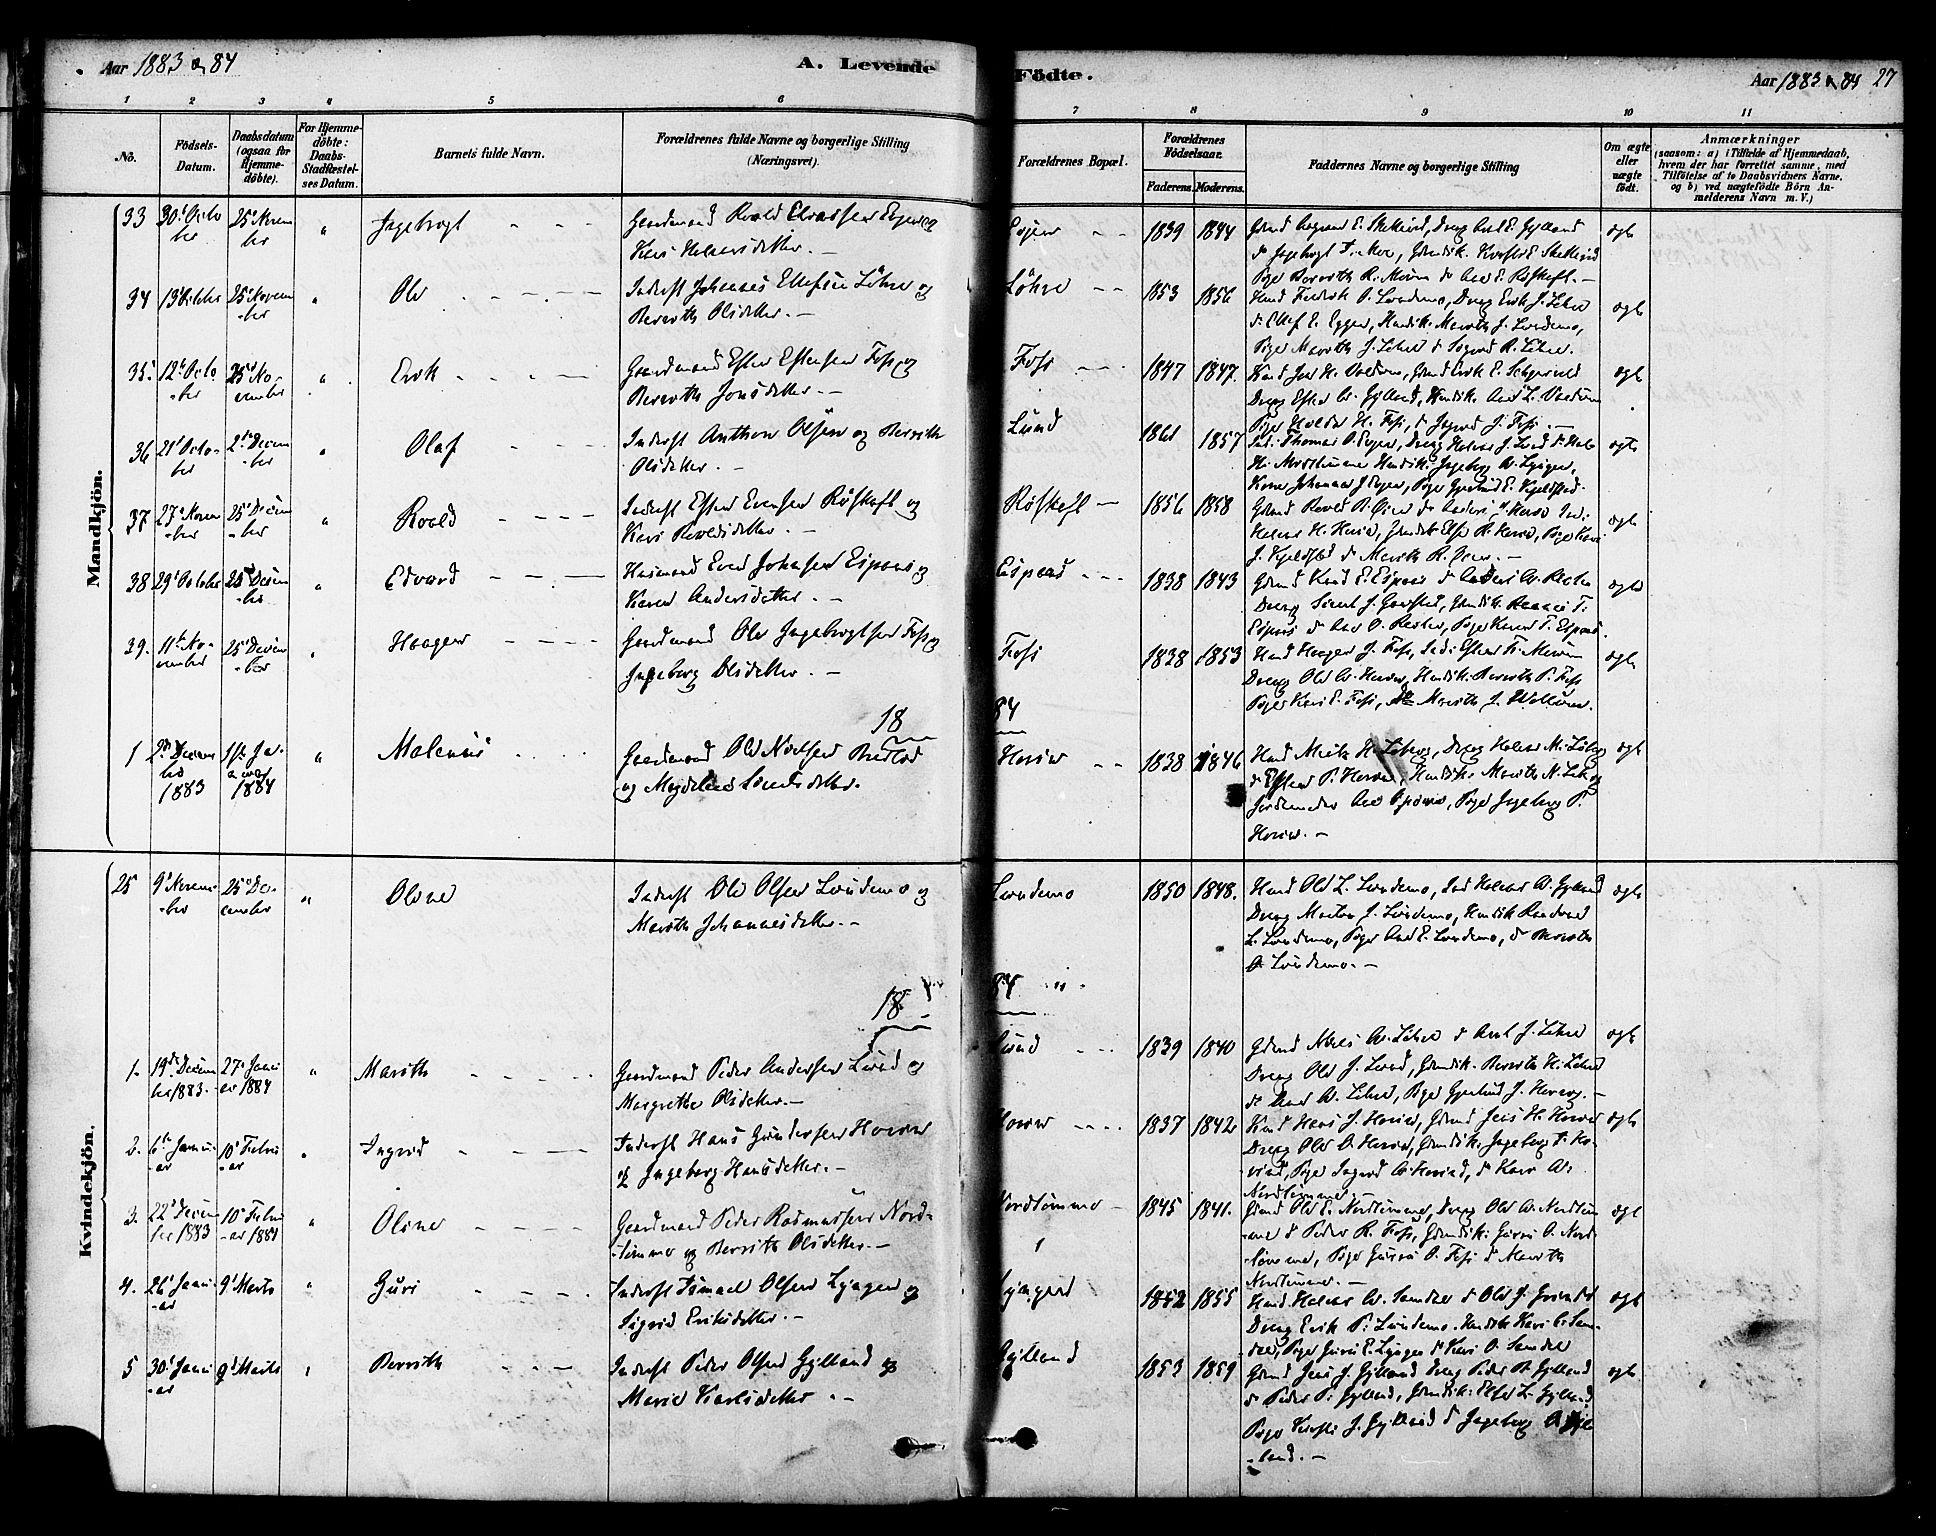 SAT, Ministerialprotokoller, klokkerbøker og fødselsregistre - Sør-Trøndelag, 692/L1105: Parish register (official) no. 692A05, 1878-1890, p. 27